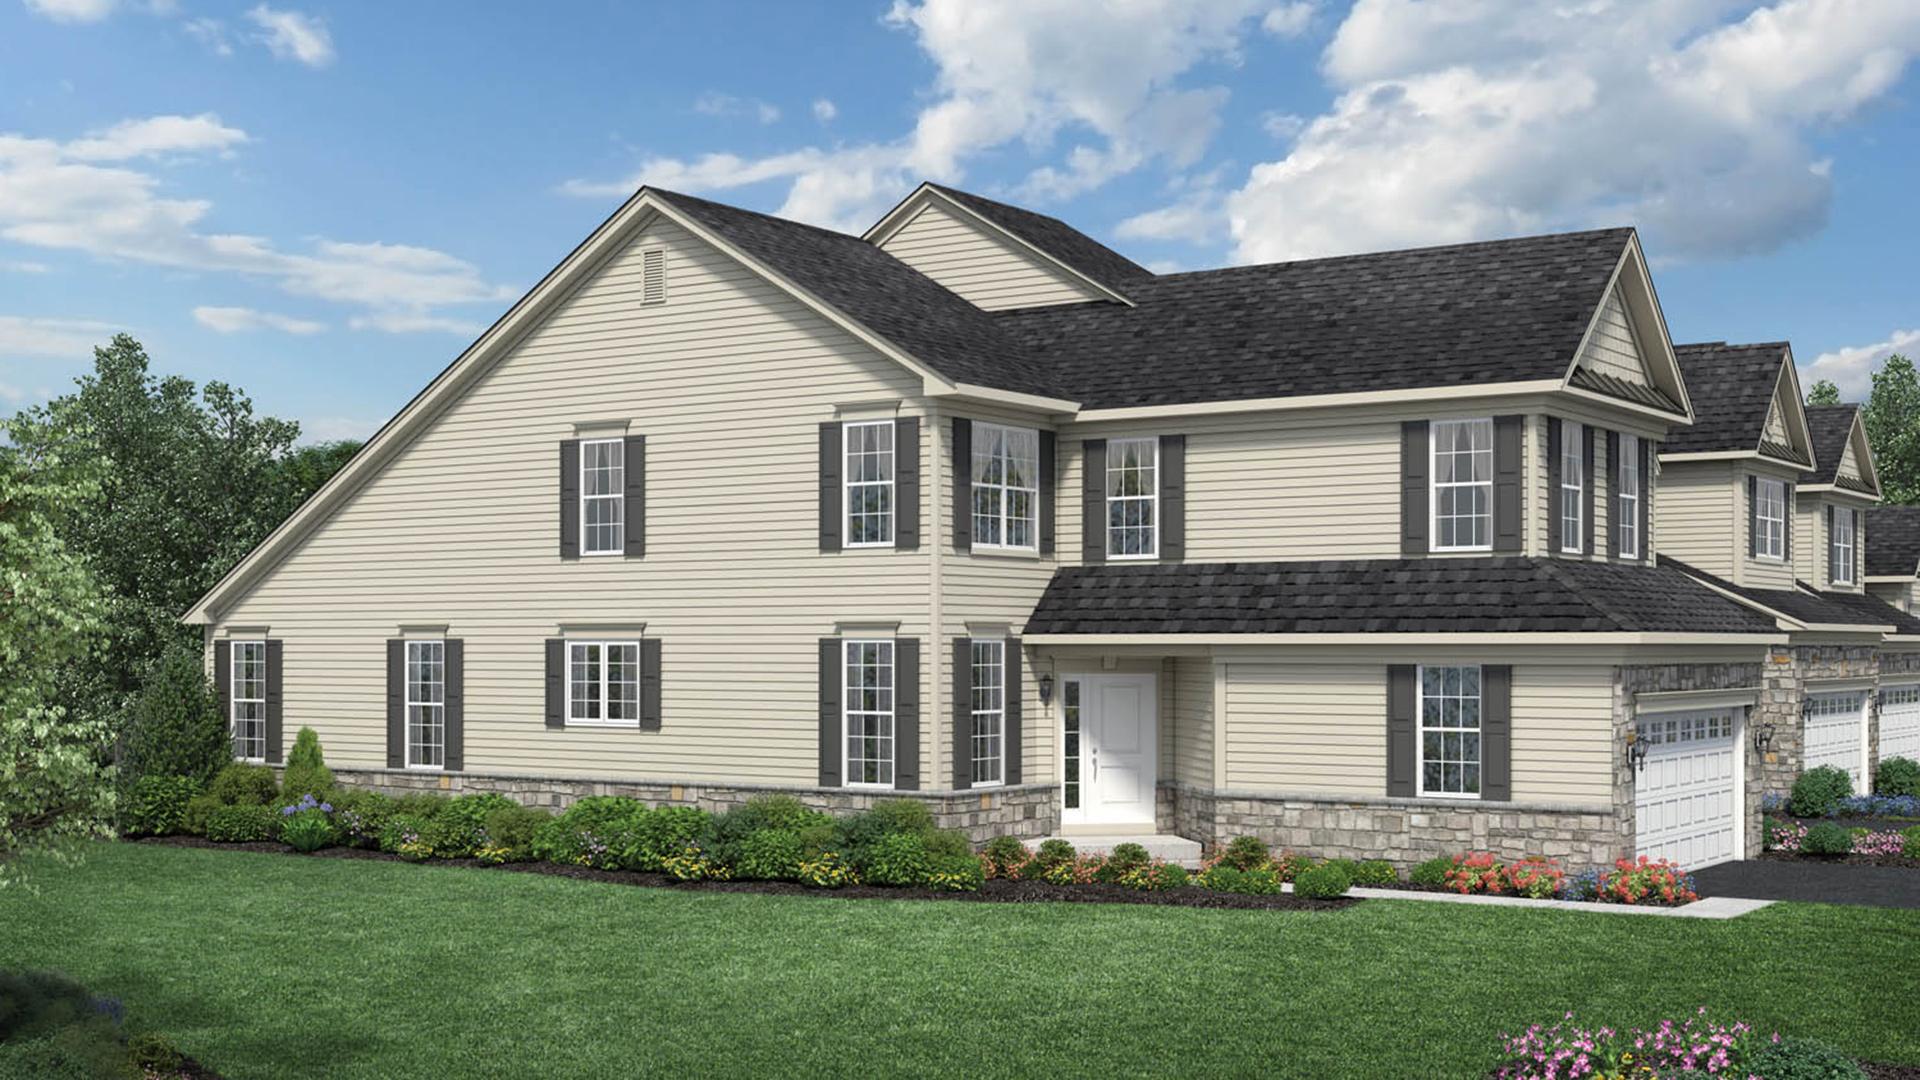 Ridgeview of novi the henderson home design for Michigan design center home tour